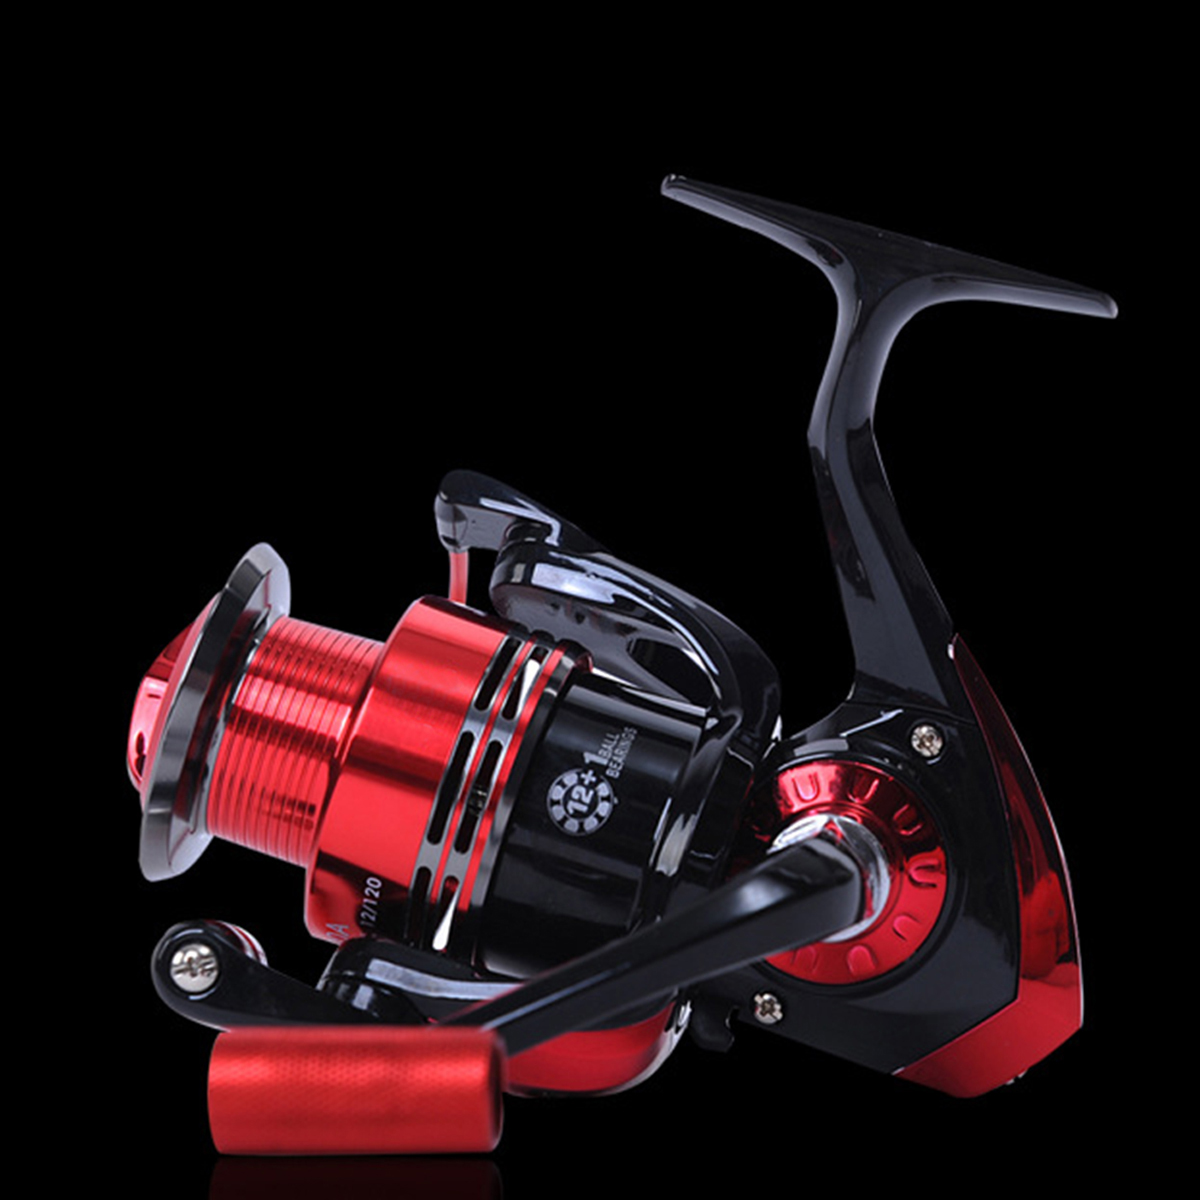 ZANLURE JM1000 12+1BB 5.2:1 Spinning Fishing Reel Right/Left Interchangeable Saltwater Reel